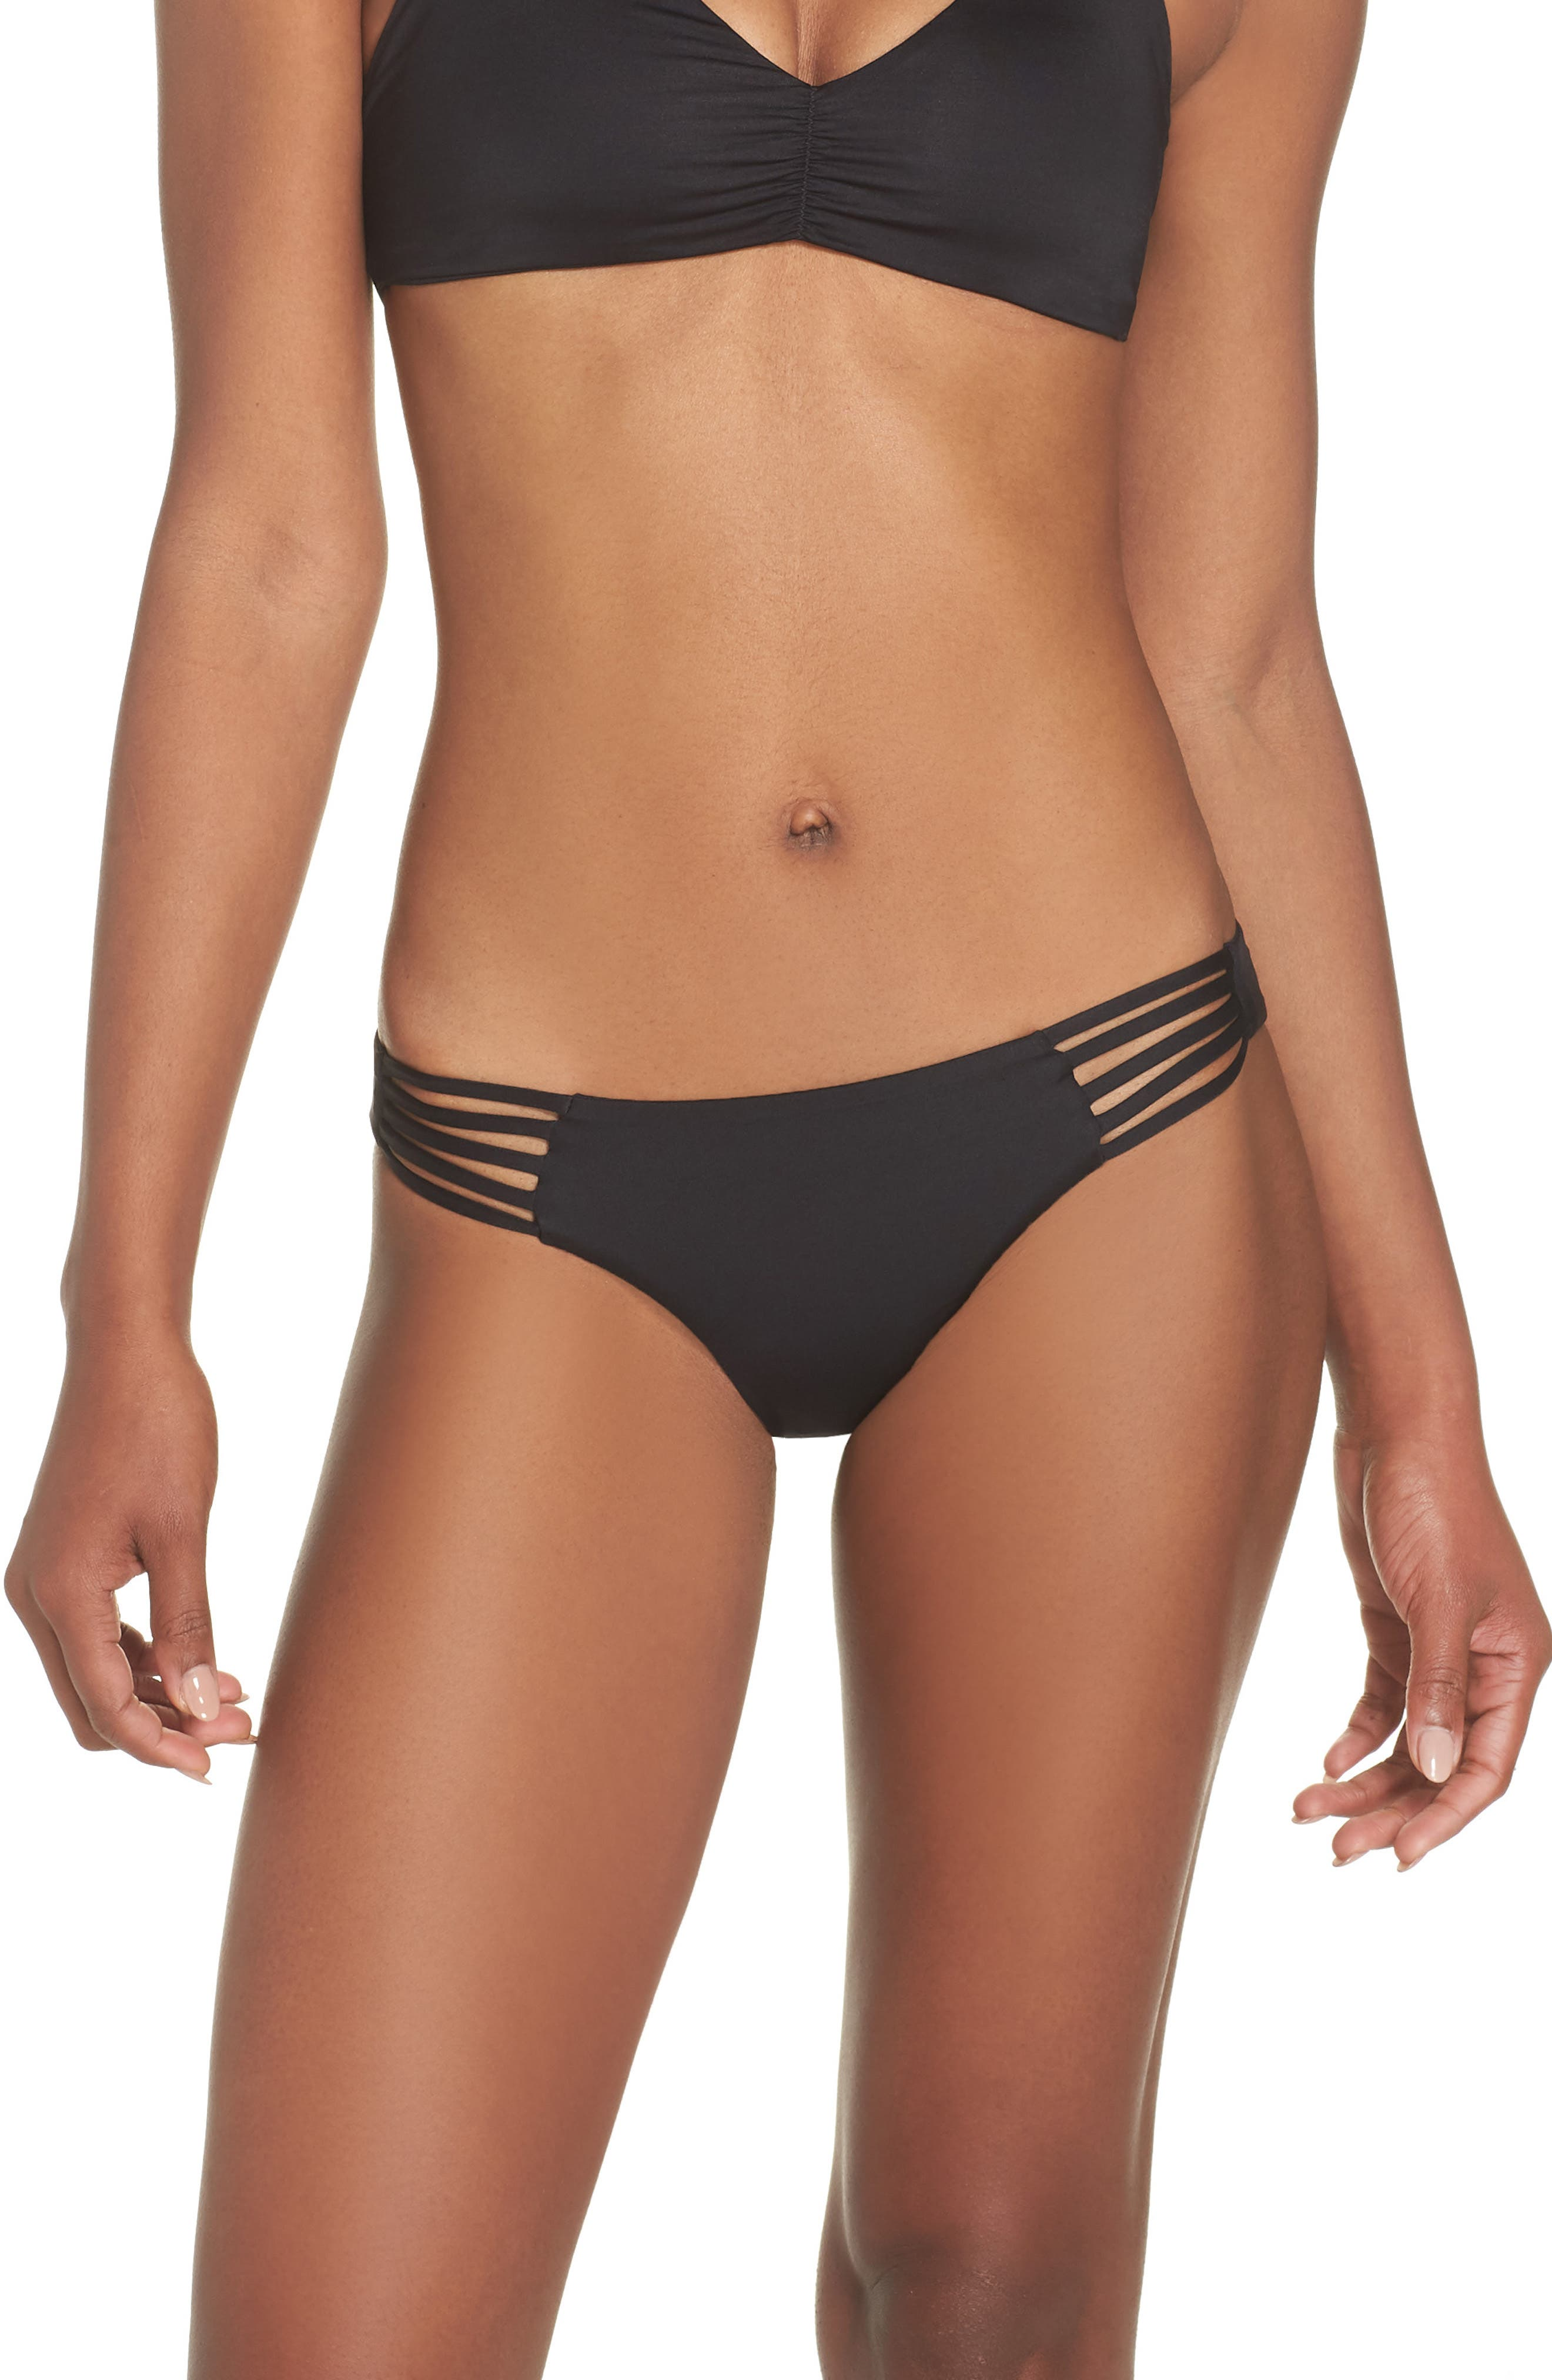 Seaglass Bay Reversible Bikini Bottoms,                             Main thumbnail 1, color,                             BLACK